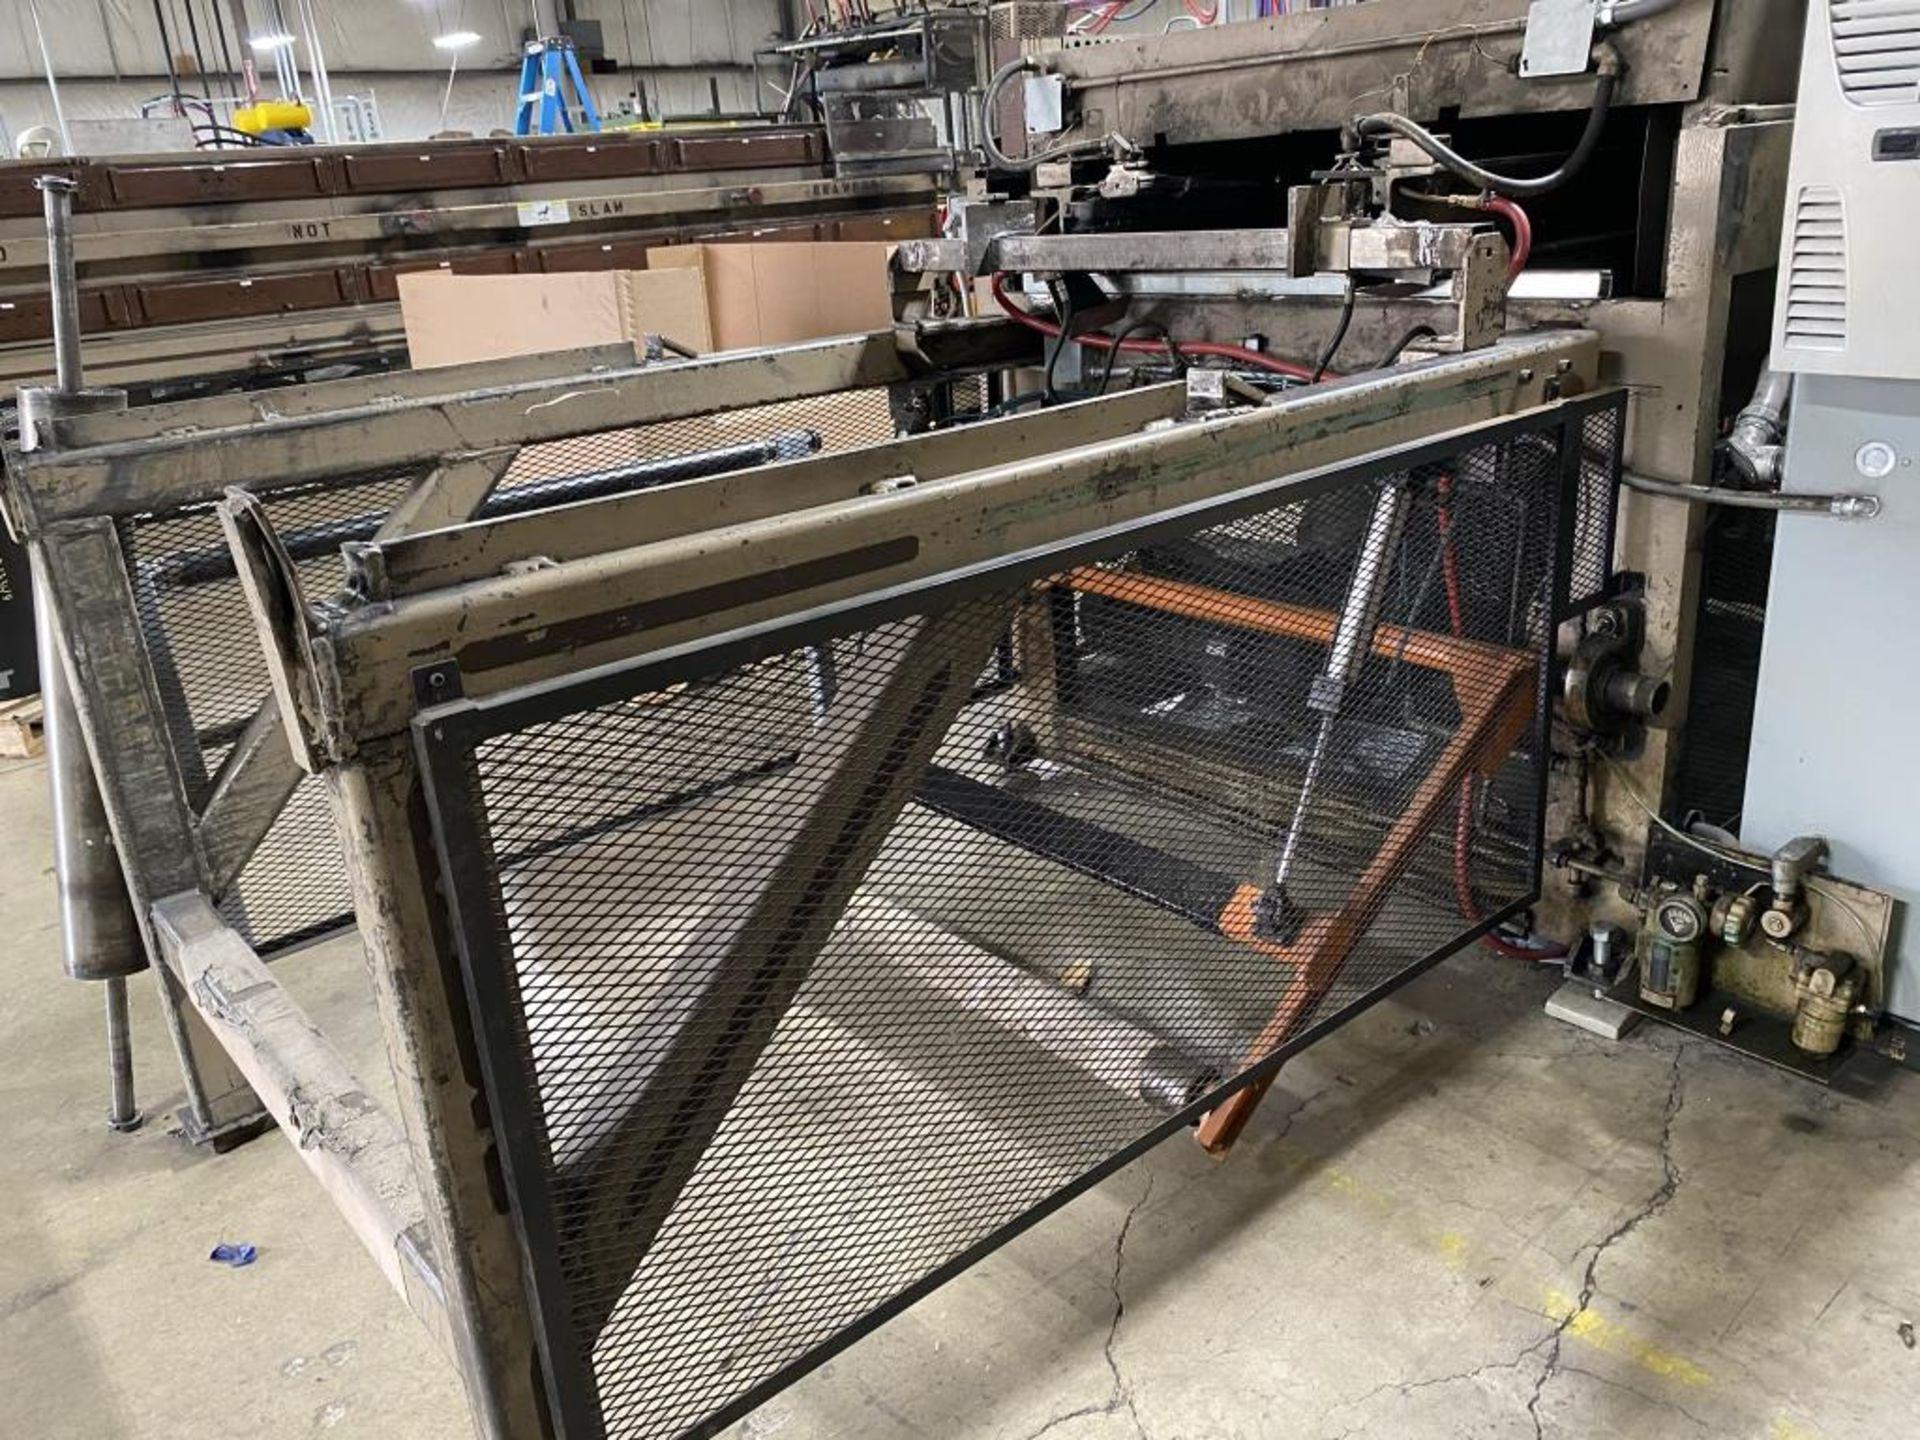 Rebuilt Thin Gauge Thermoformer - Image 14 of 26